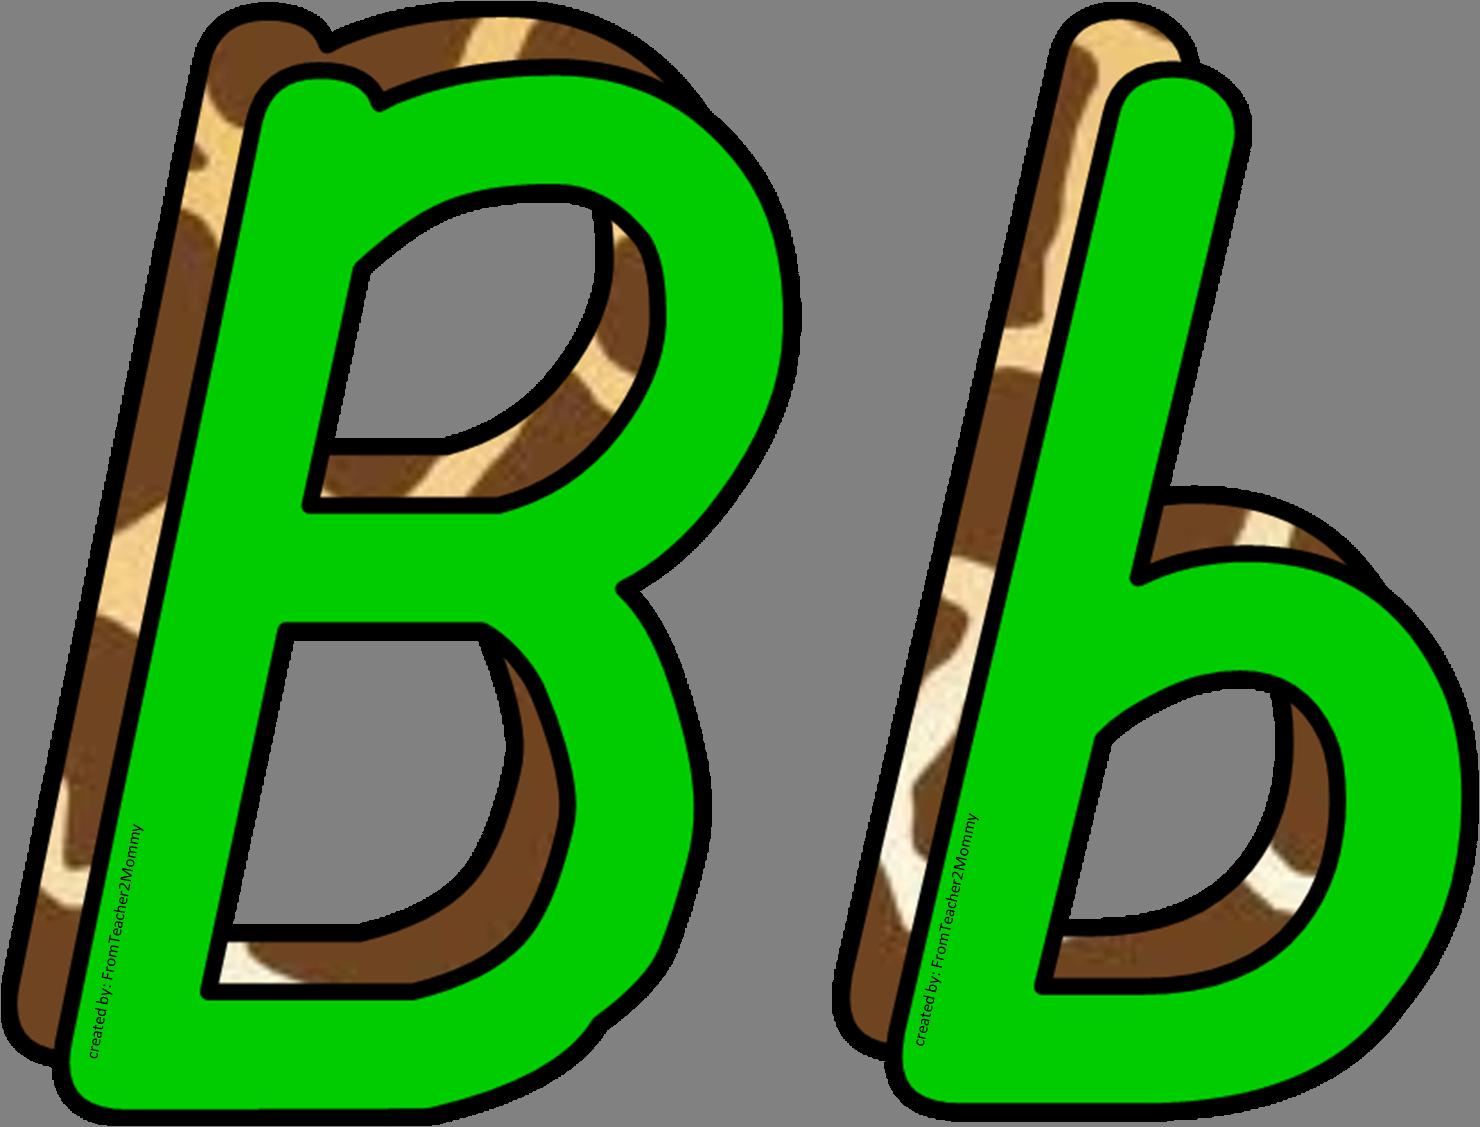 Clipart letter b b black and white stock Clipart letter b b - ClipartFest black and white stock